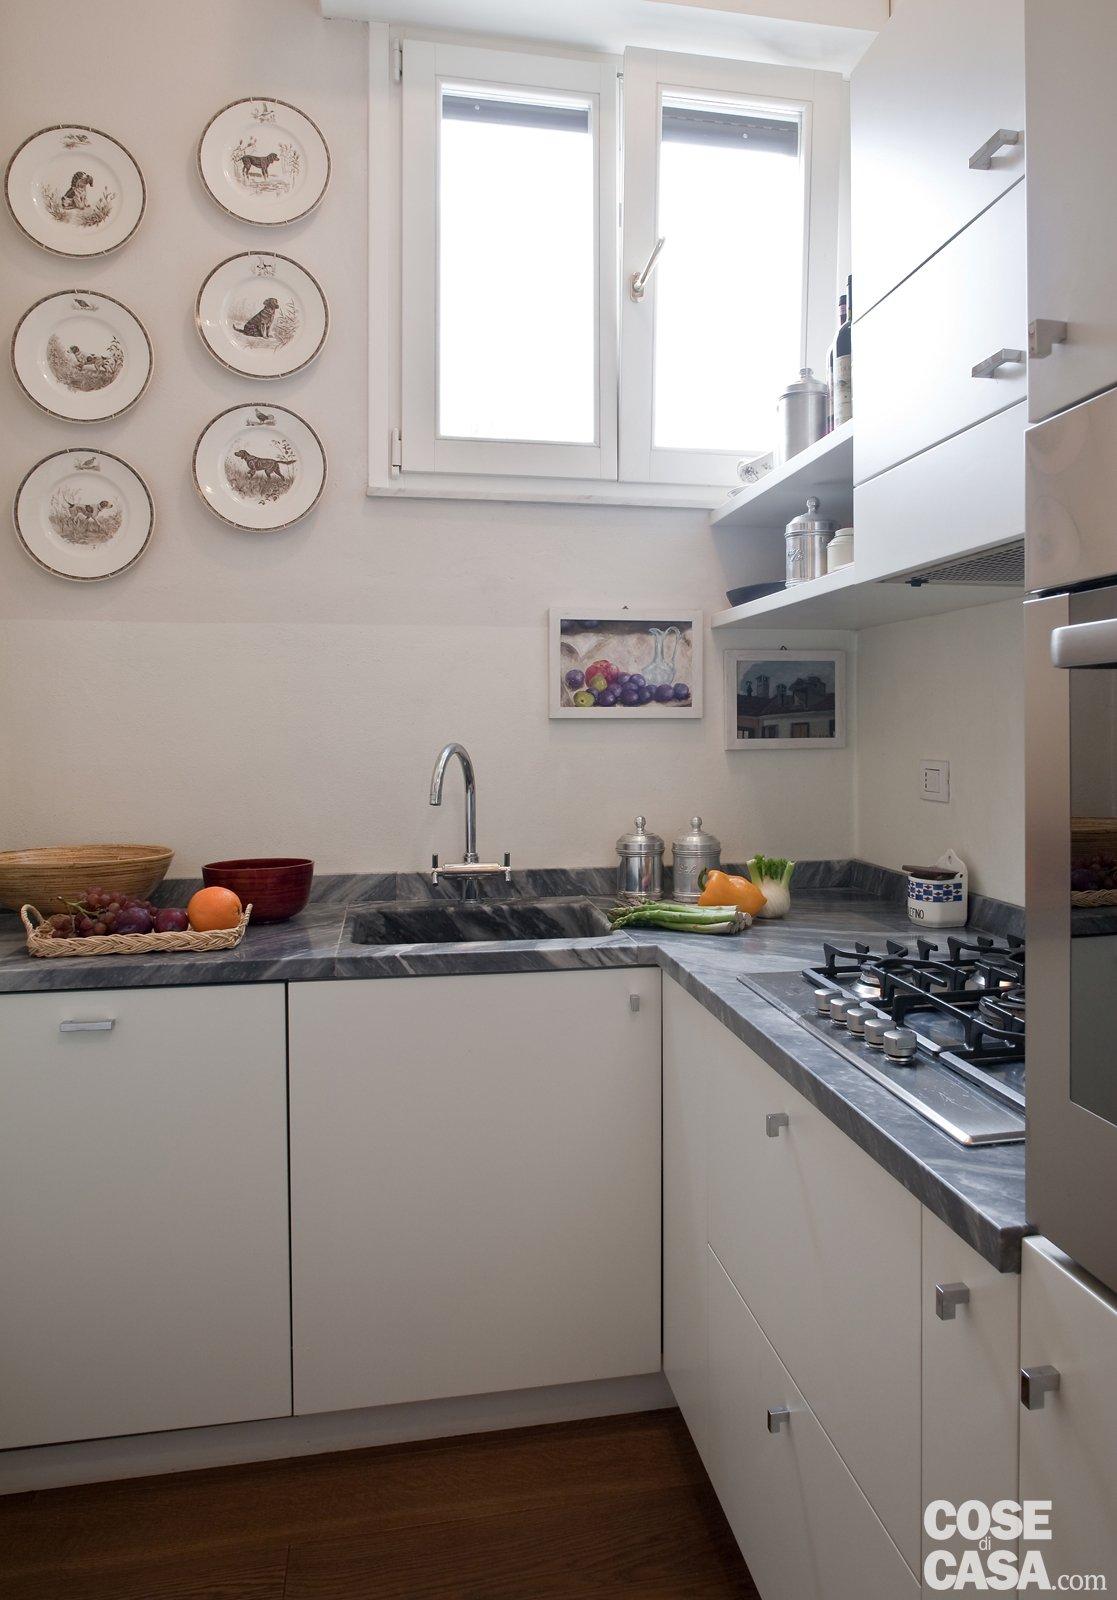 Angolari Cucina Ikea ~ duylinh for